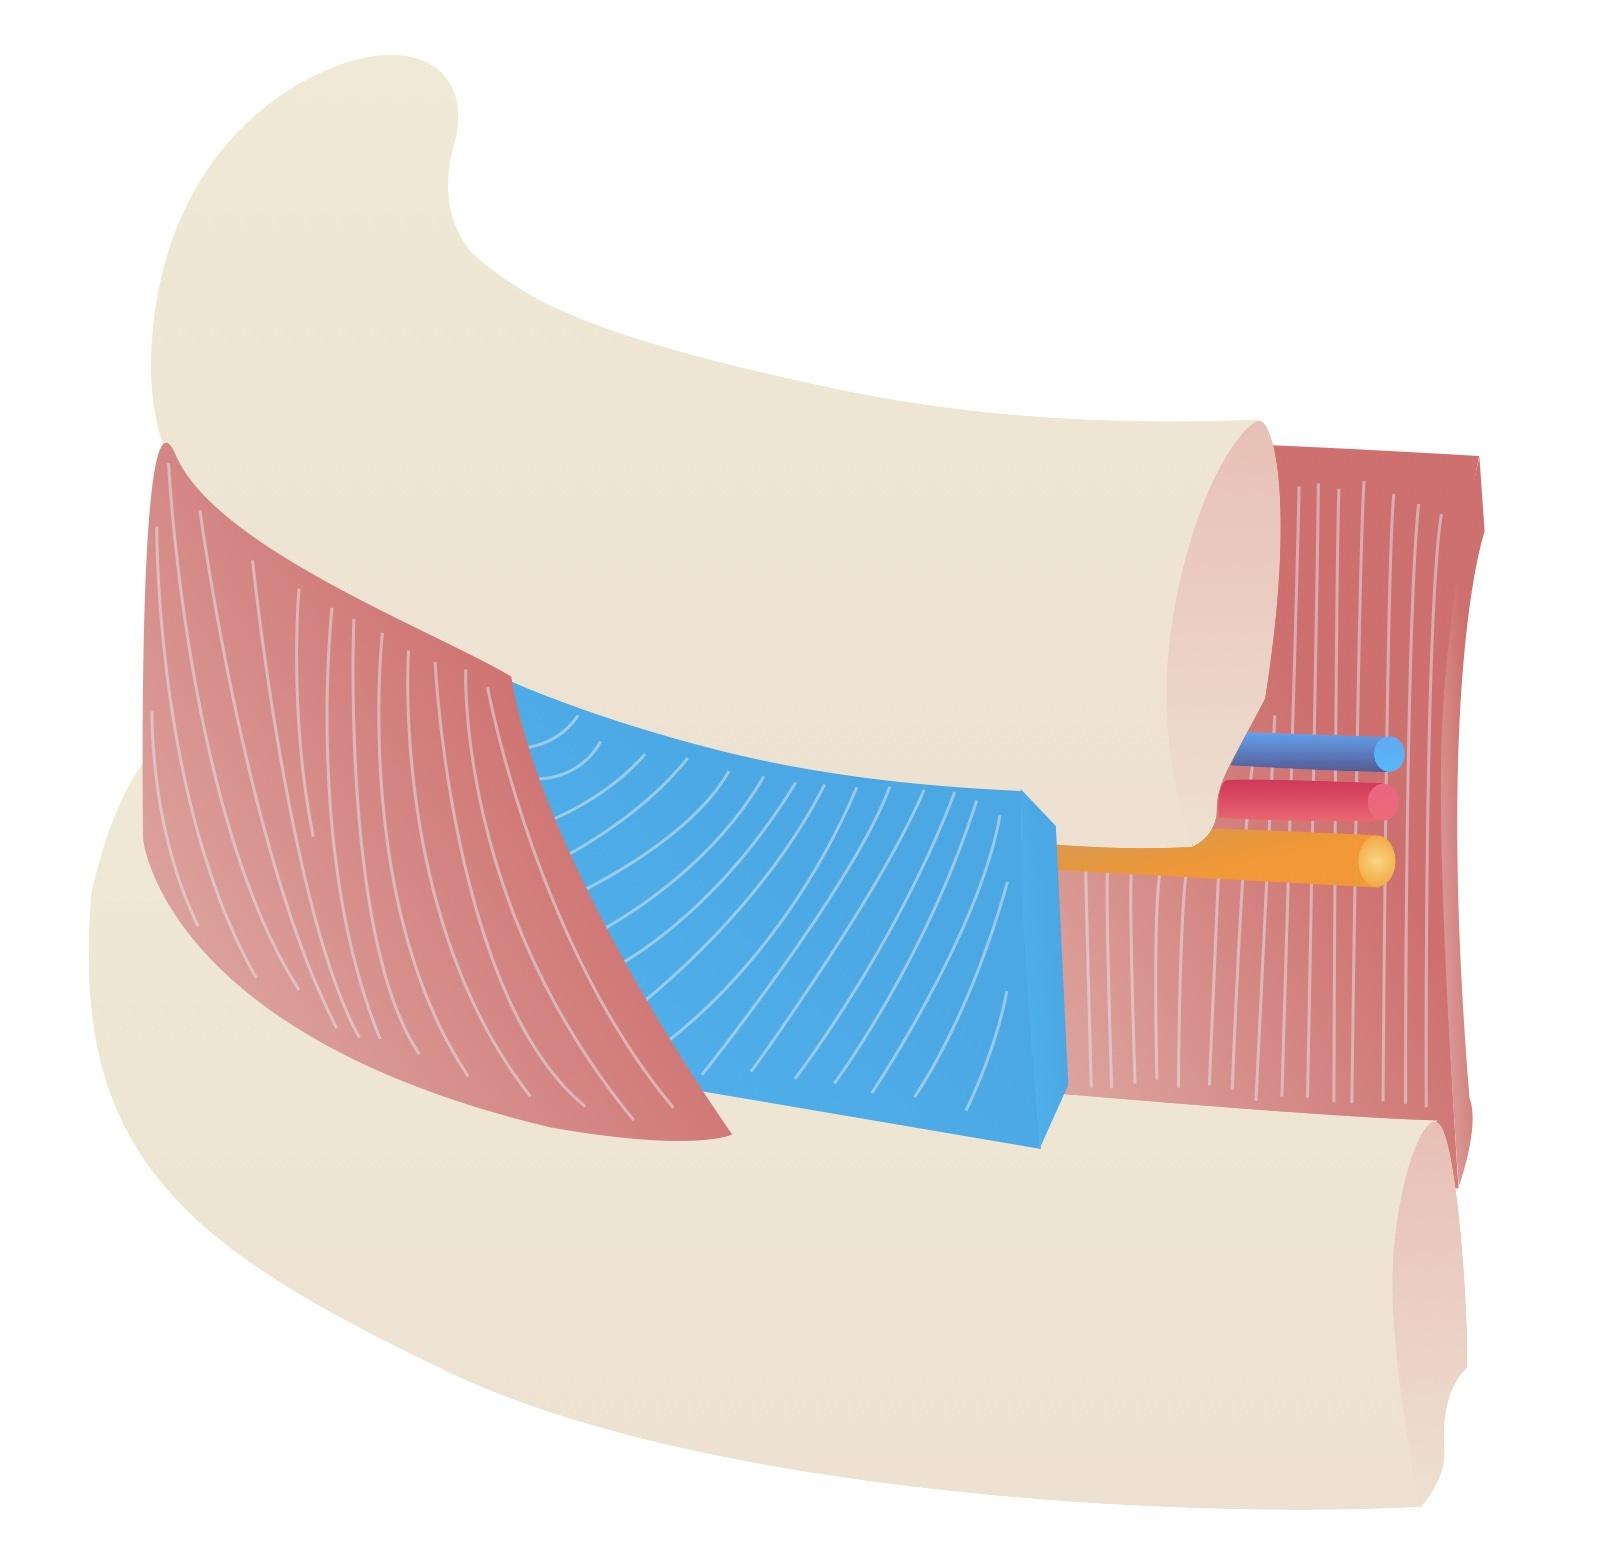 Internal intercostal muscles